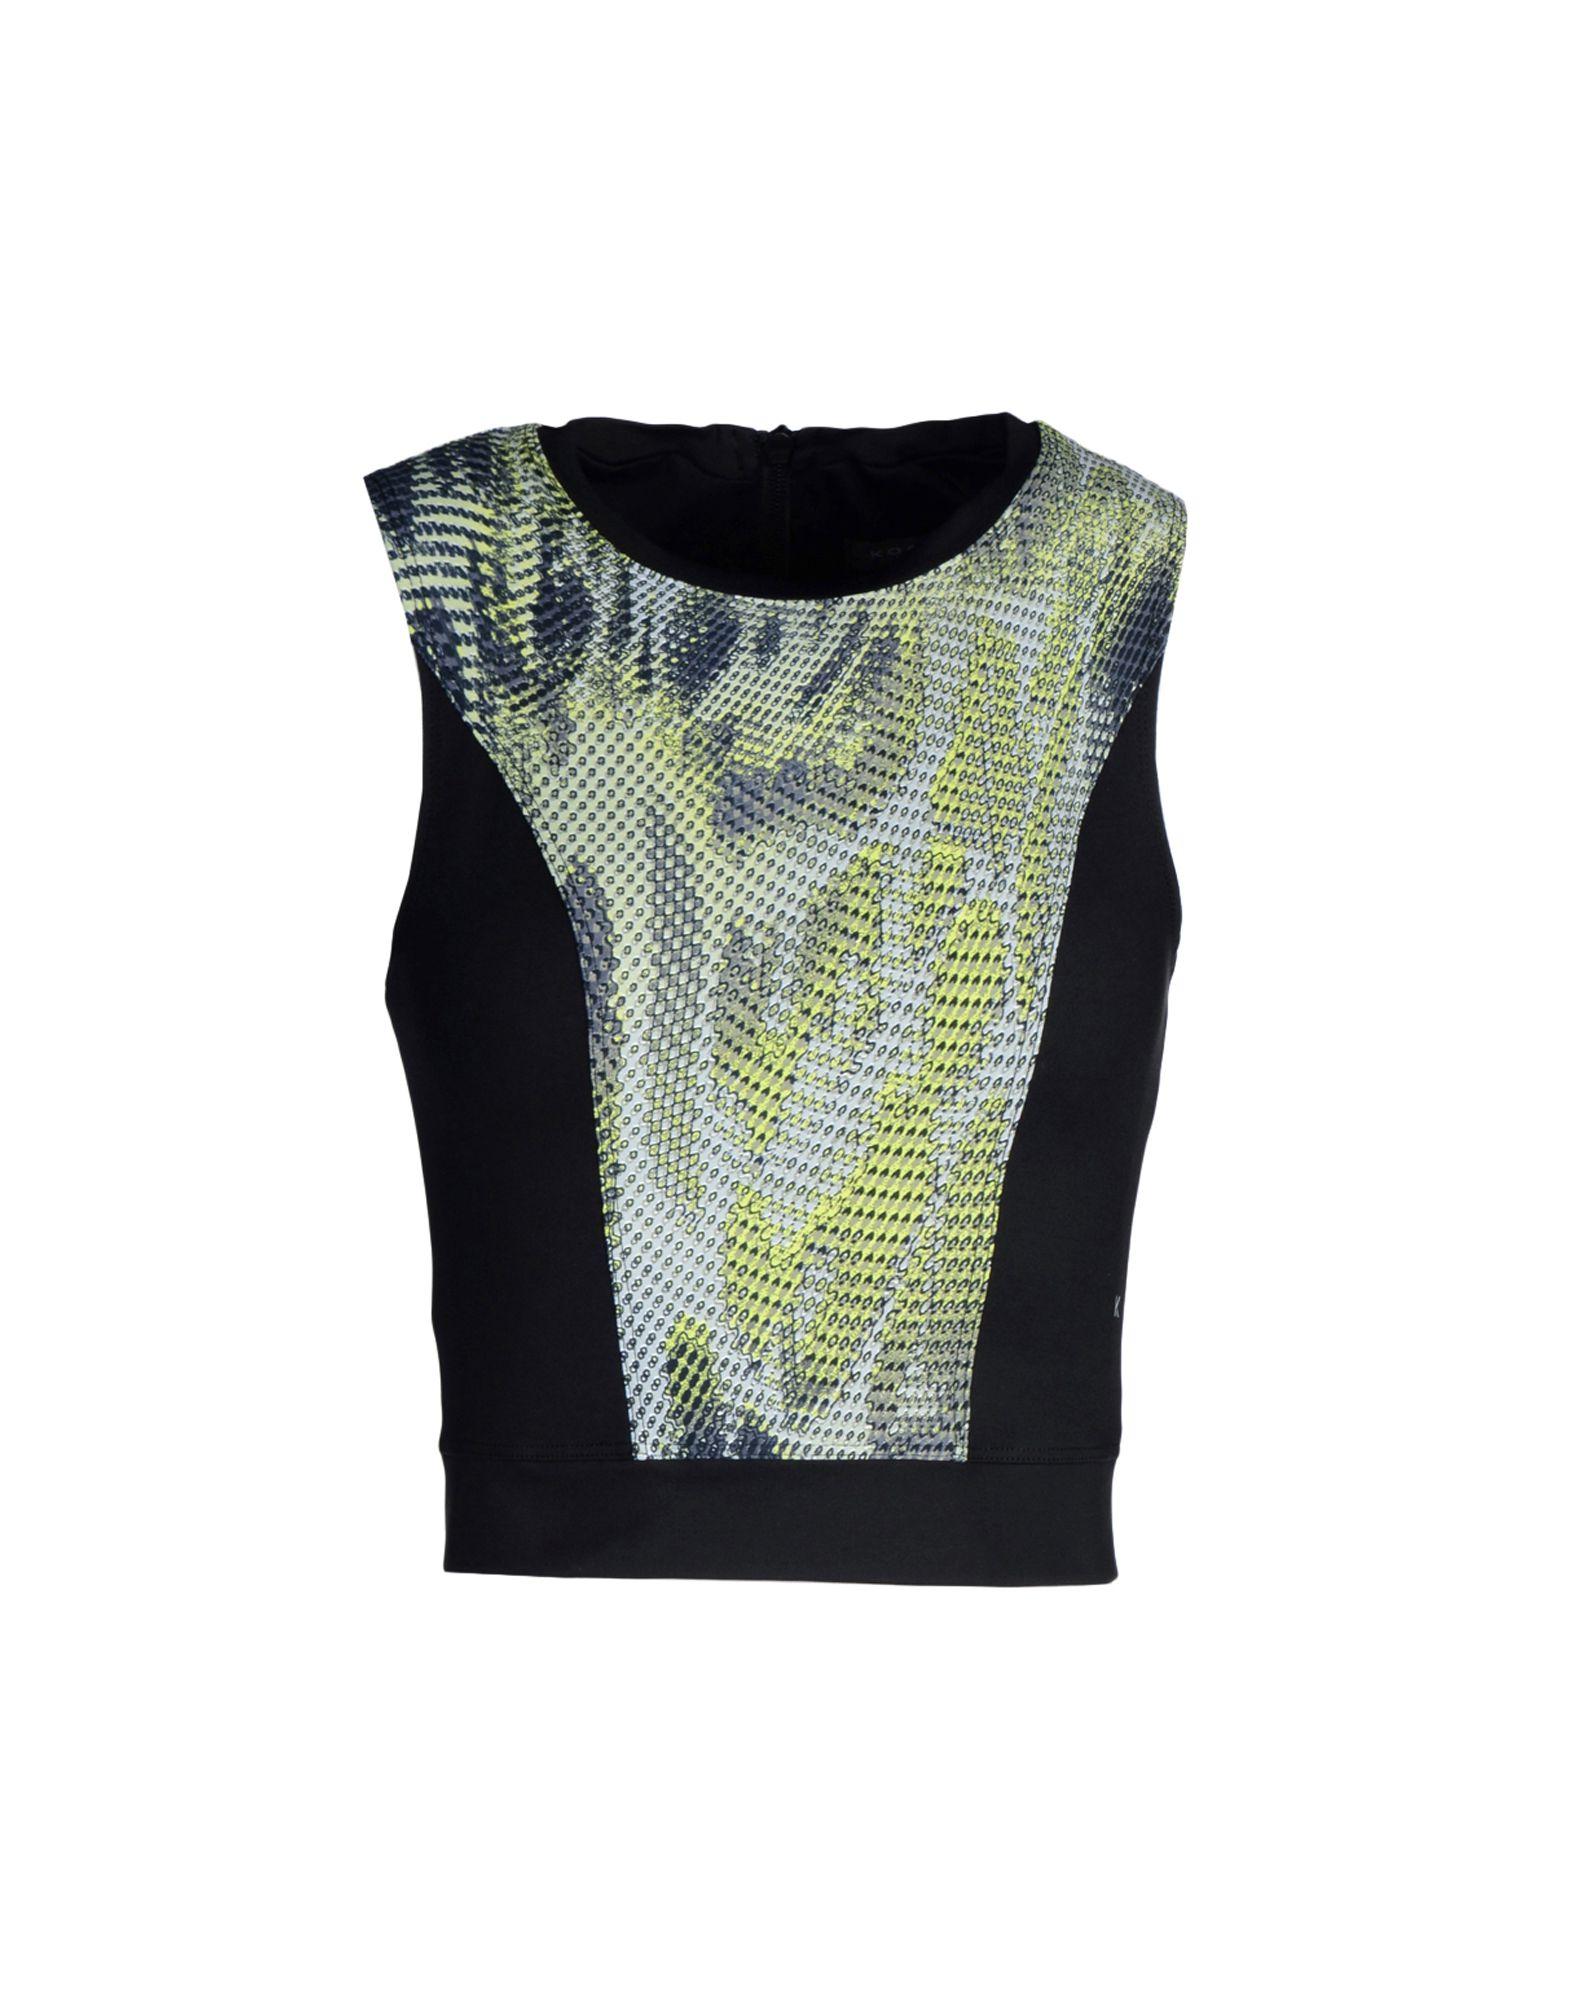 KORAL ACTIVEWEAR Топ без рукавов koral activewear топ без рукавов